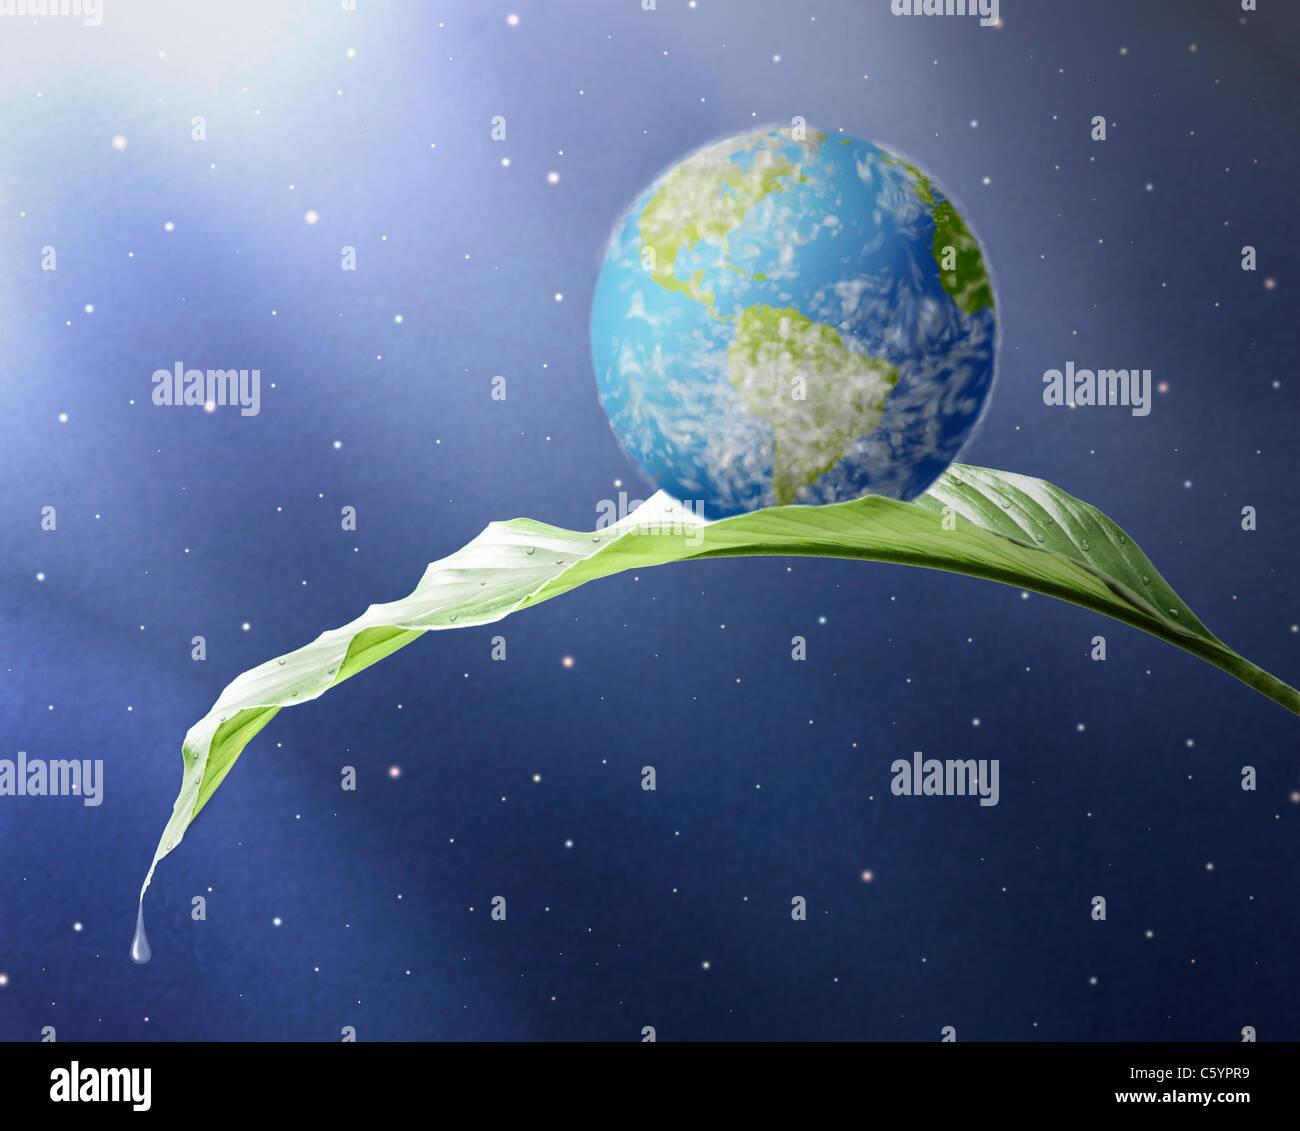 USA, Illinois, Metamora, planet earth - Stock Image